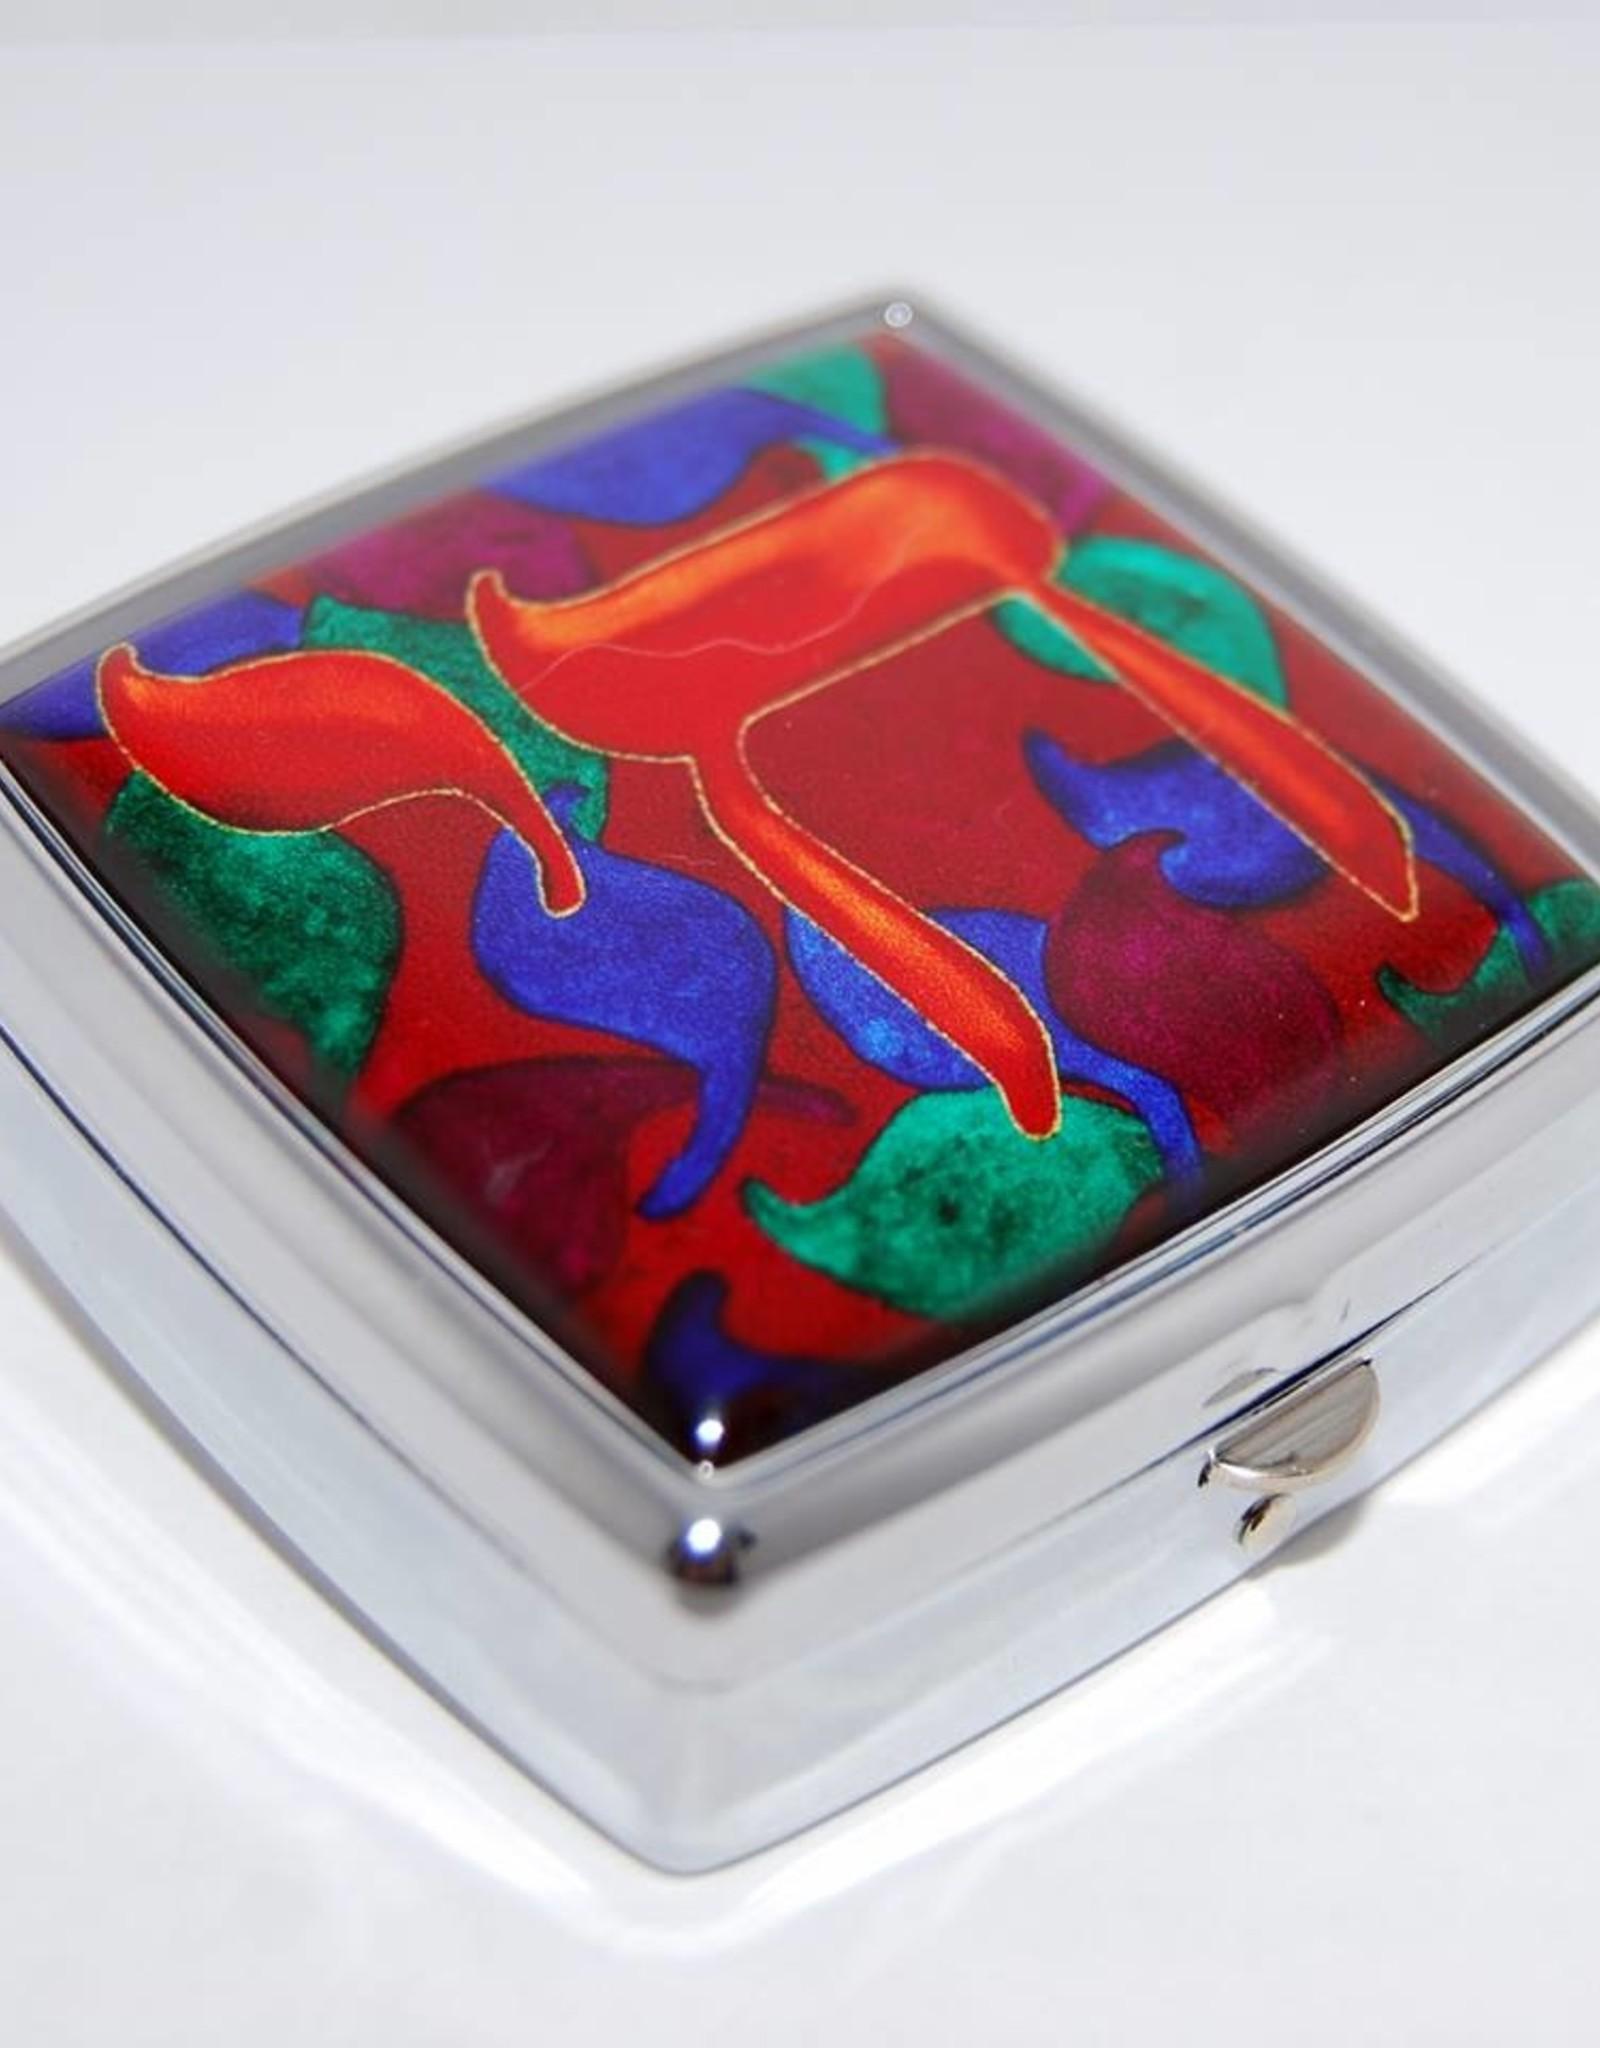 Chaipainter Pill box colorfull life